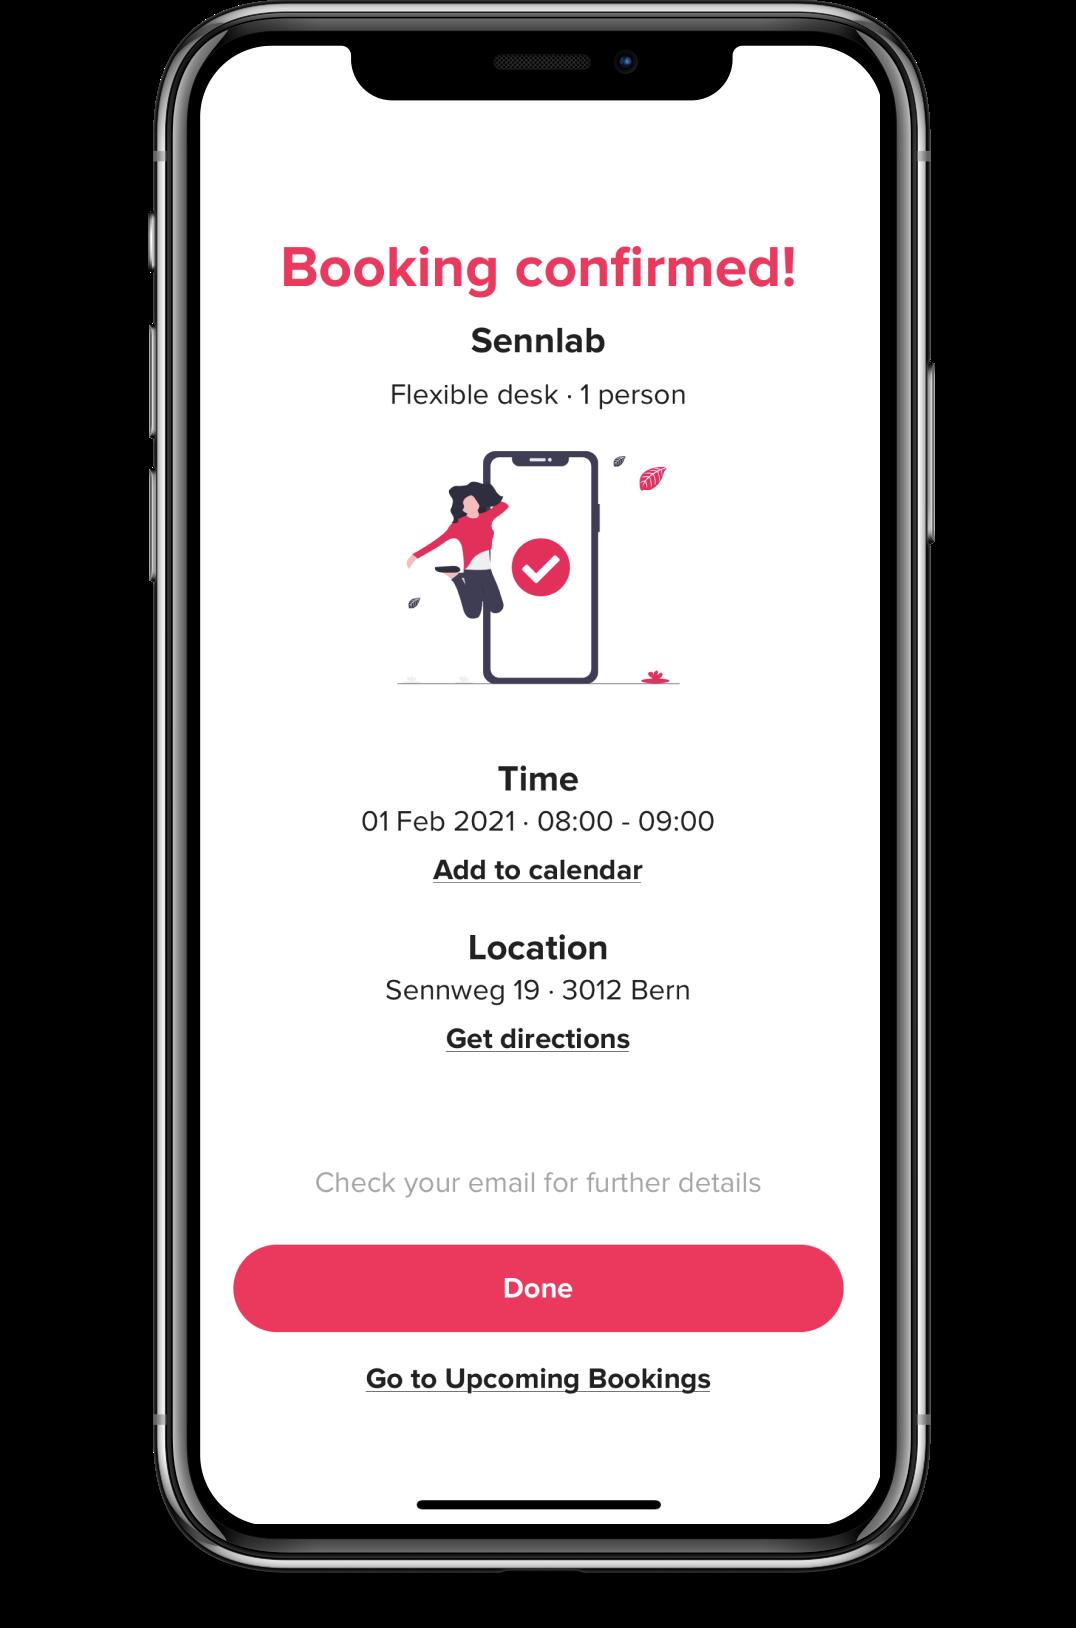 Screenshot of deskbird app booking confirmed